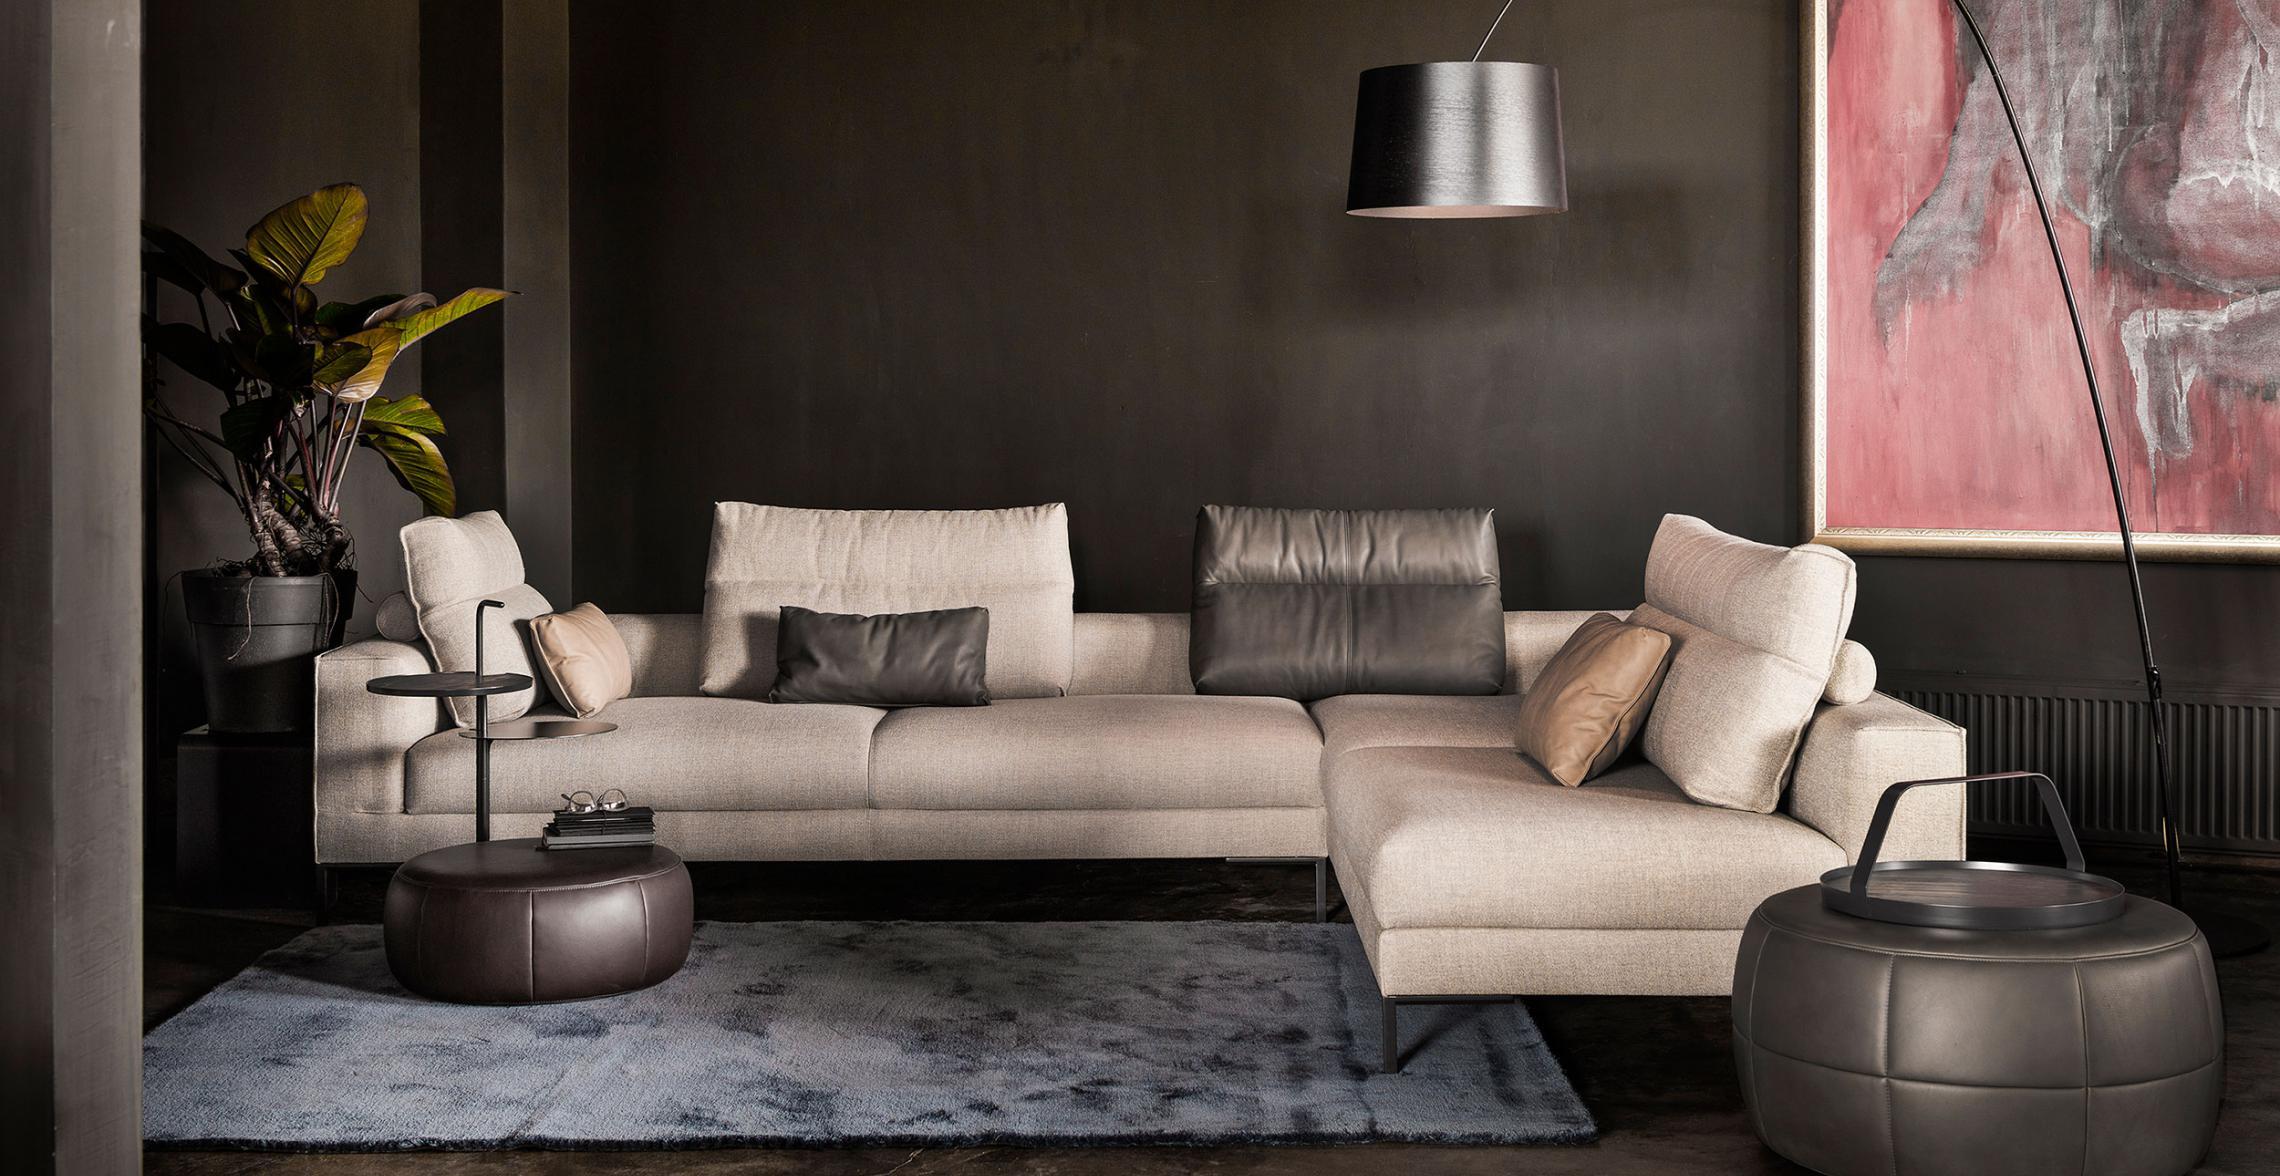 Design meubelen interieur plus peer design eetkamers salons - Decor interieur ...